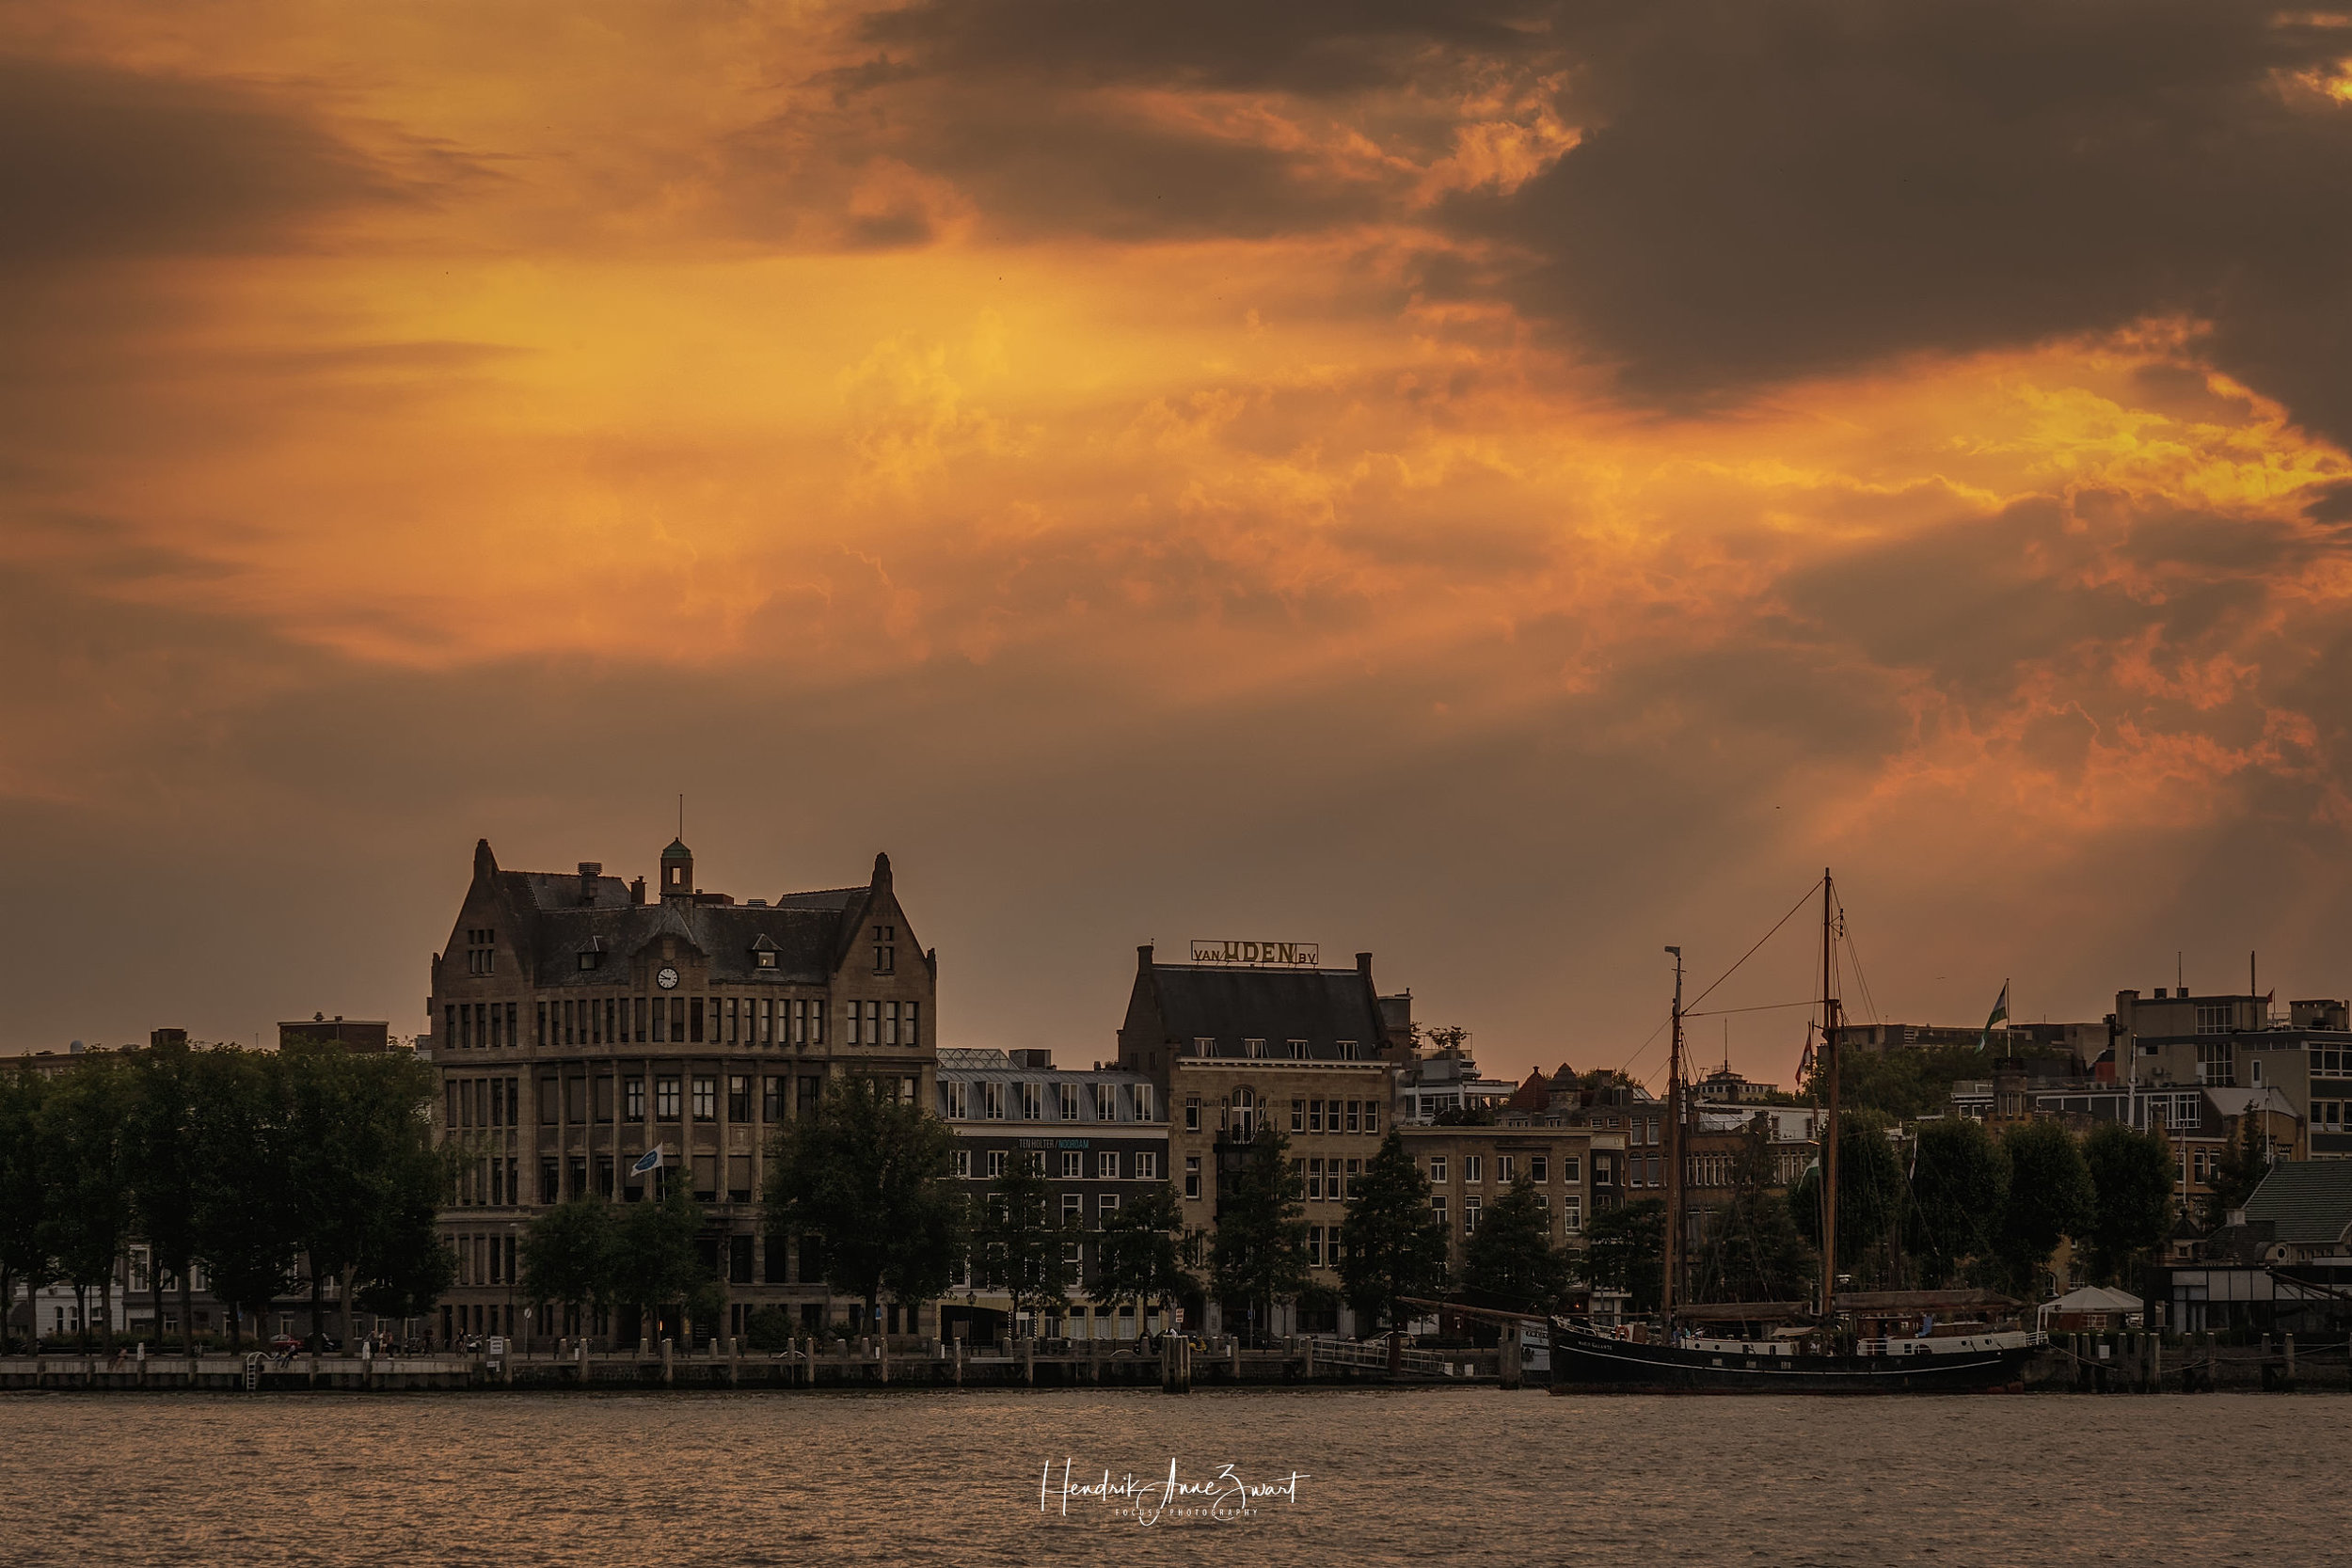 Rotterdam_Maas_Sunset_3.jpg